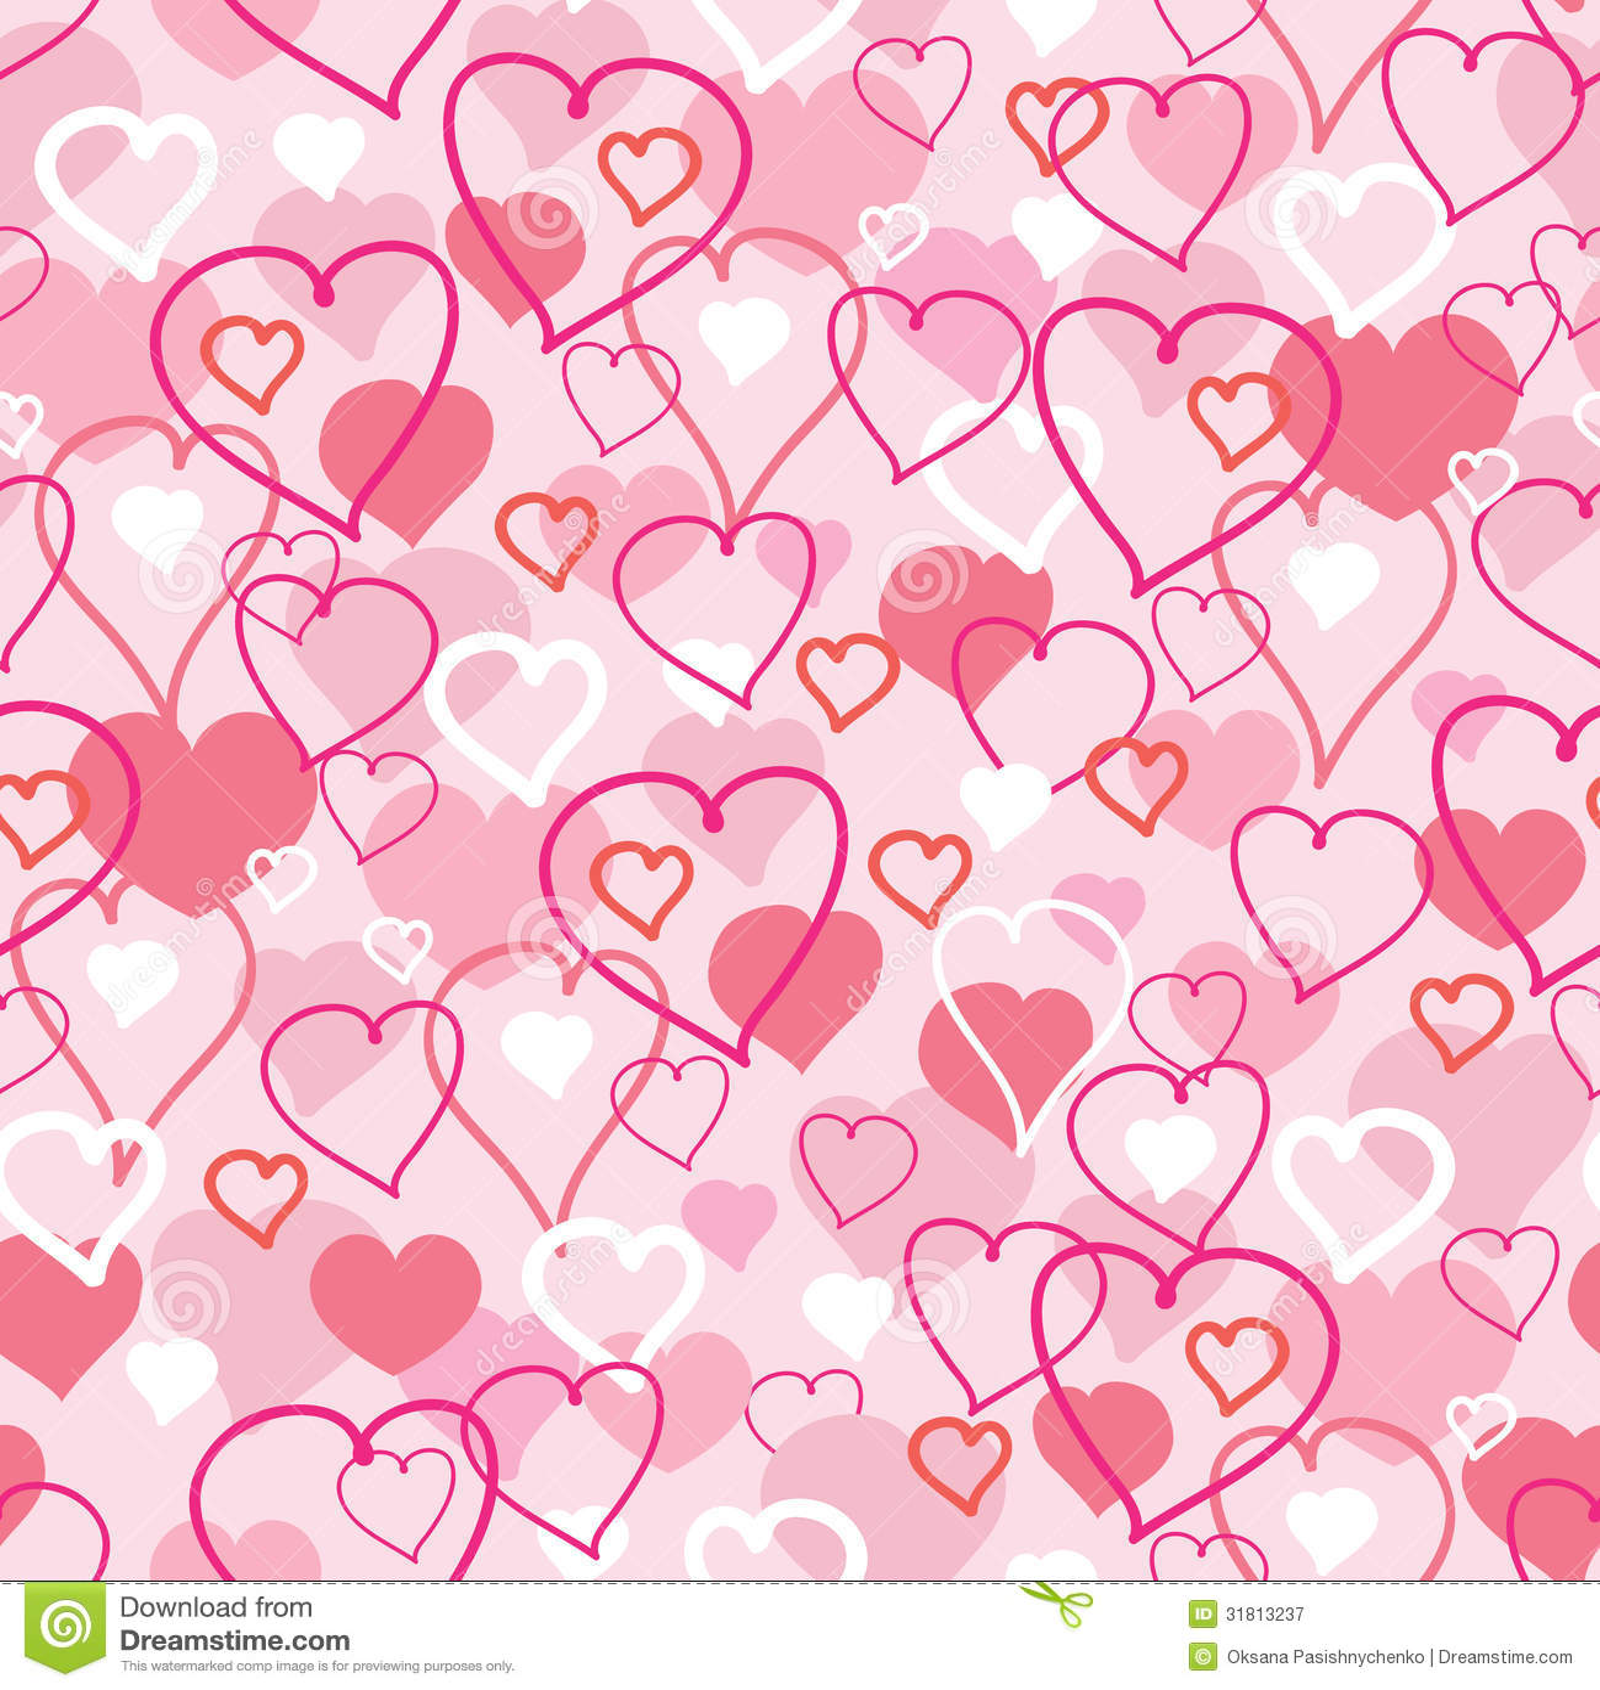 Valentine S Day Hearts Seamless Pattern Background Stock